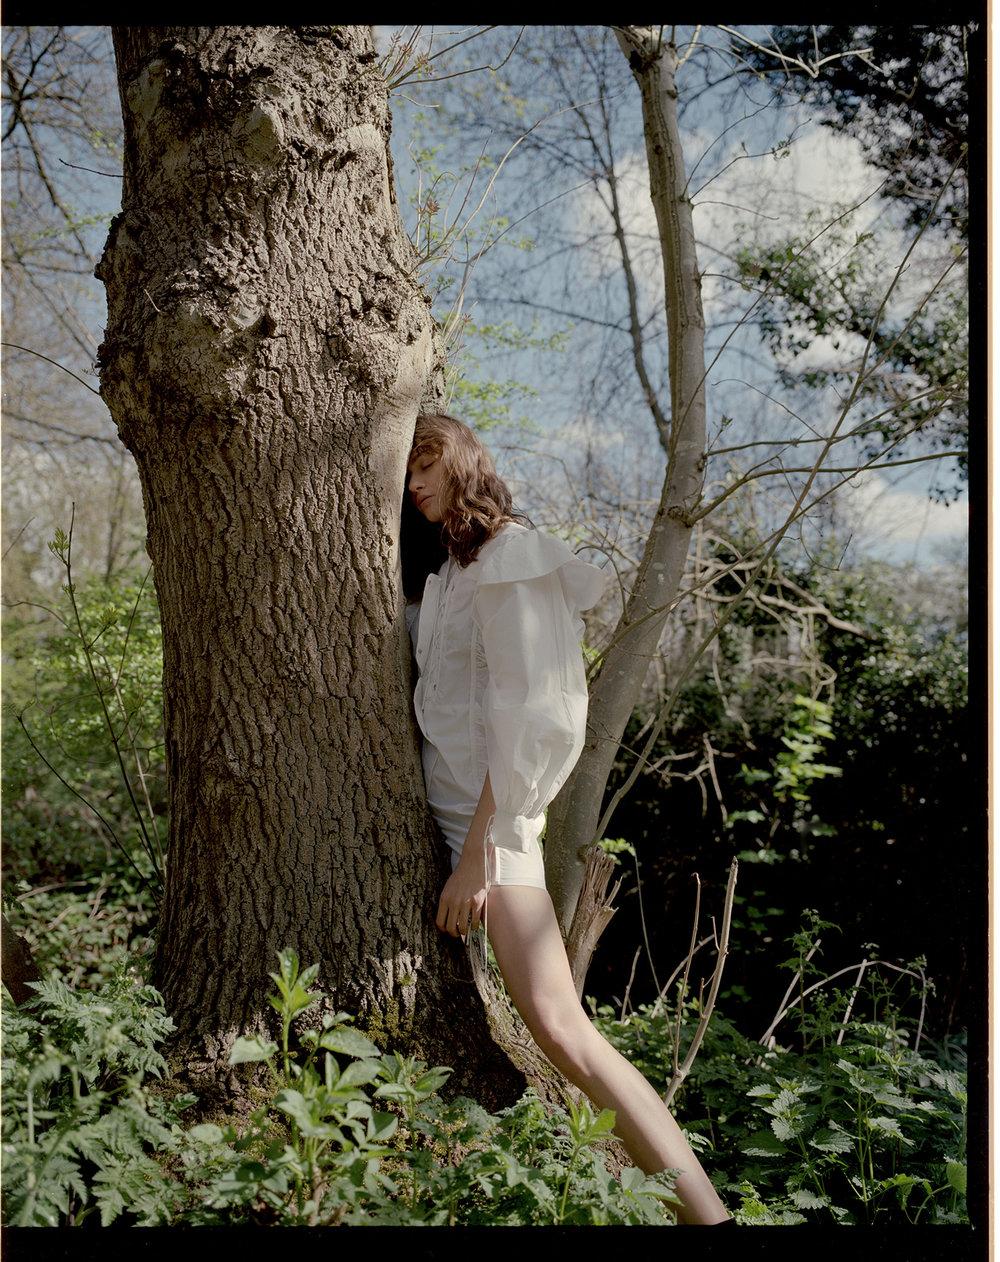 ln367_r29_sustainable_fashion_0368.jpg